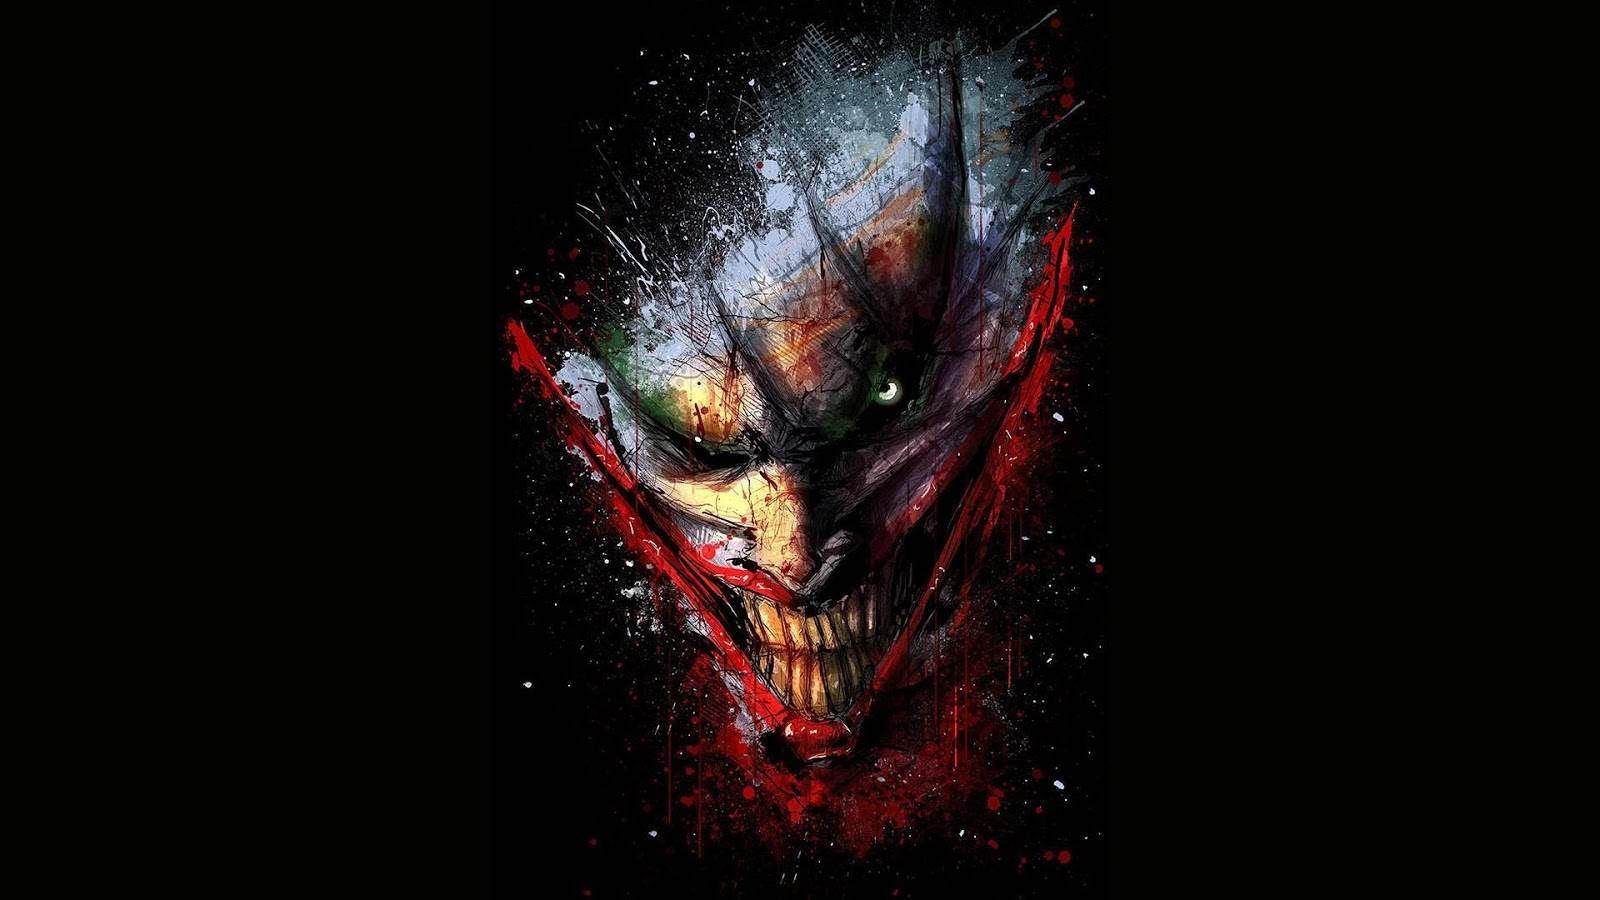 batman joker desktop wallpapers, download free hd wallpapers 1600